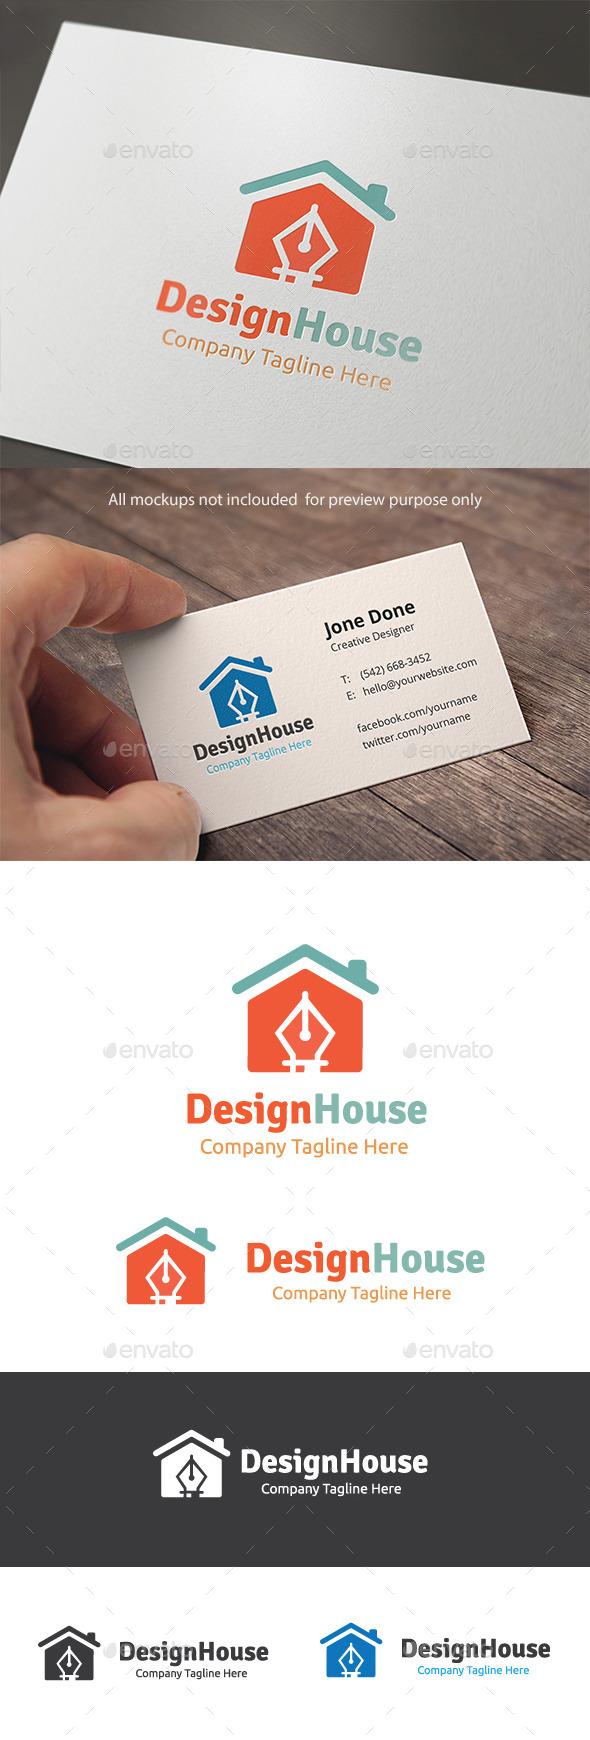 GraphicRiver Design House 11095613